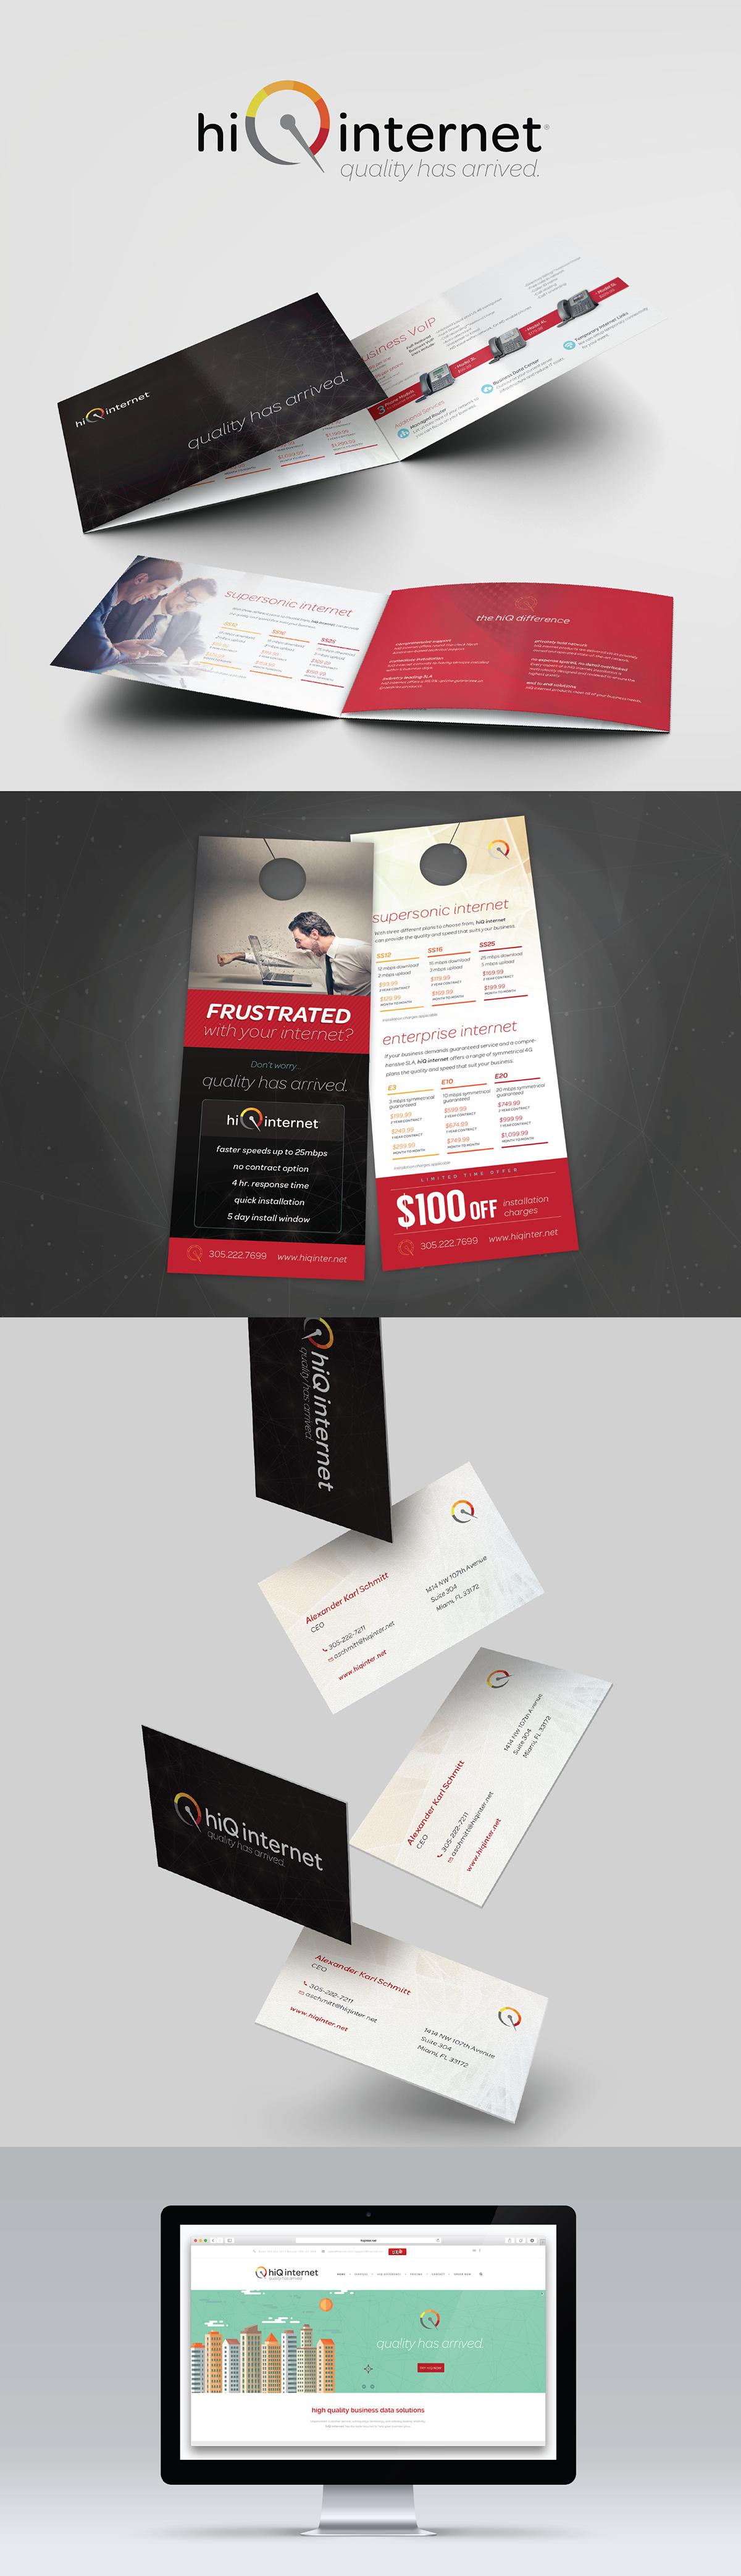 hiq internet Internet miami Quality brochure wordpress logo Icon speed florida SUPERSONIC MBPS Data